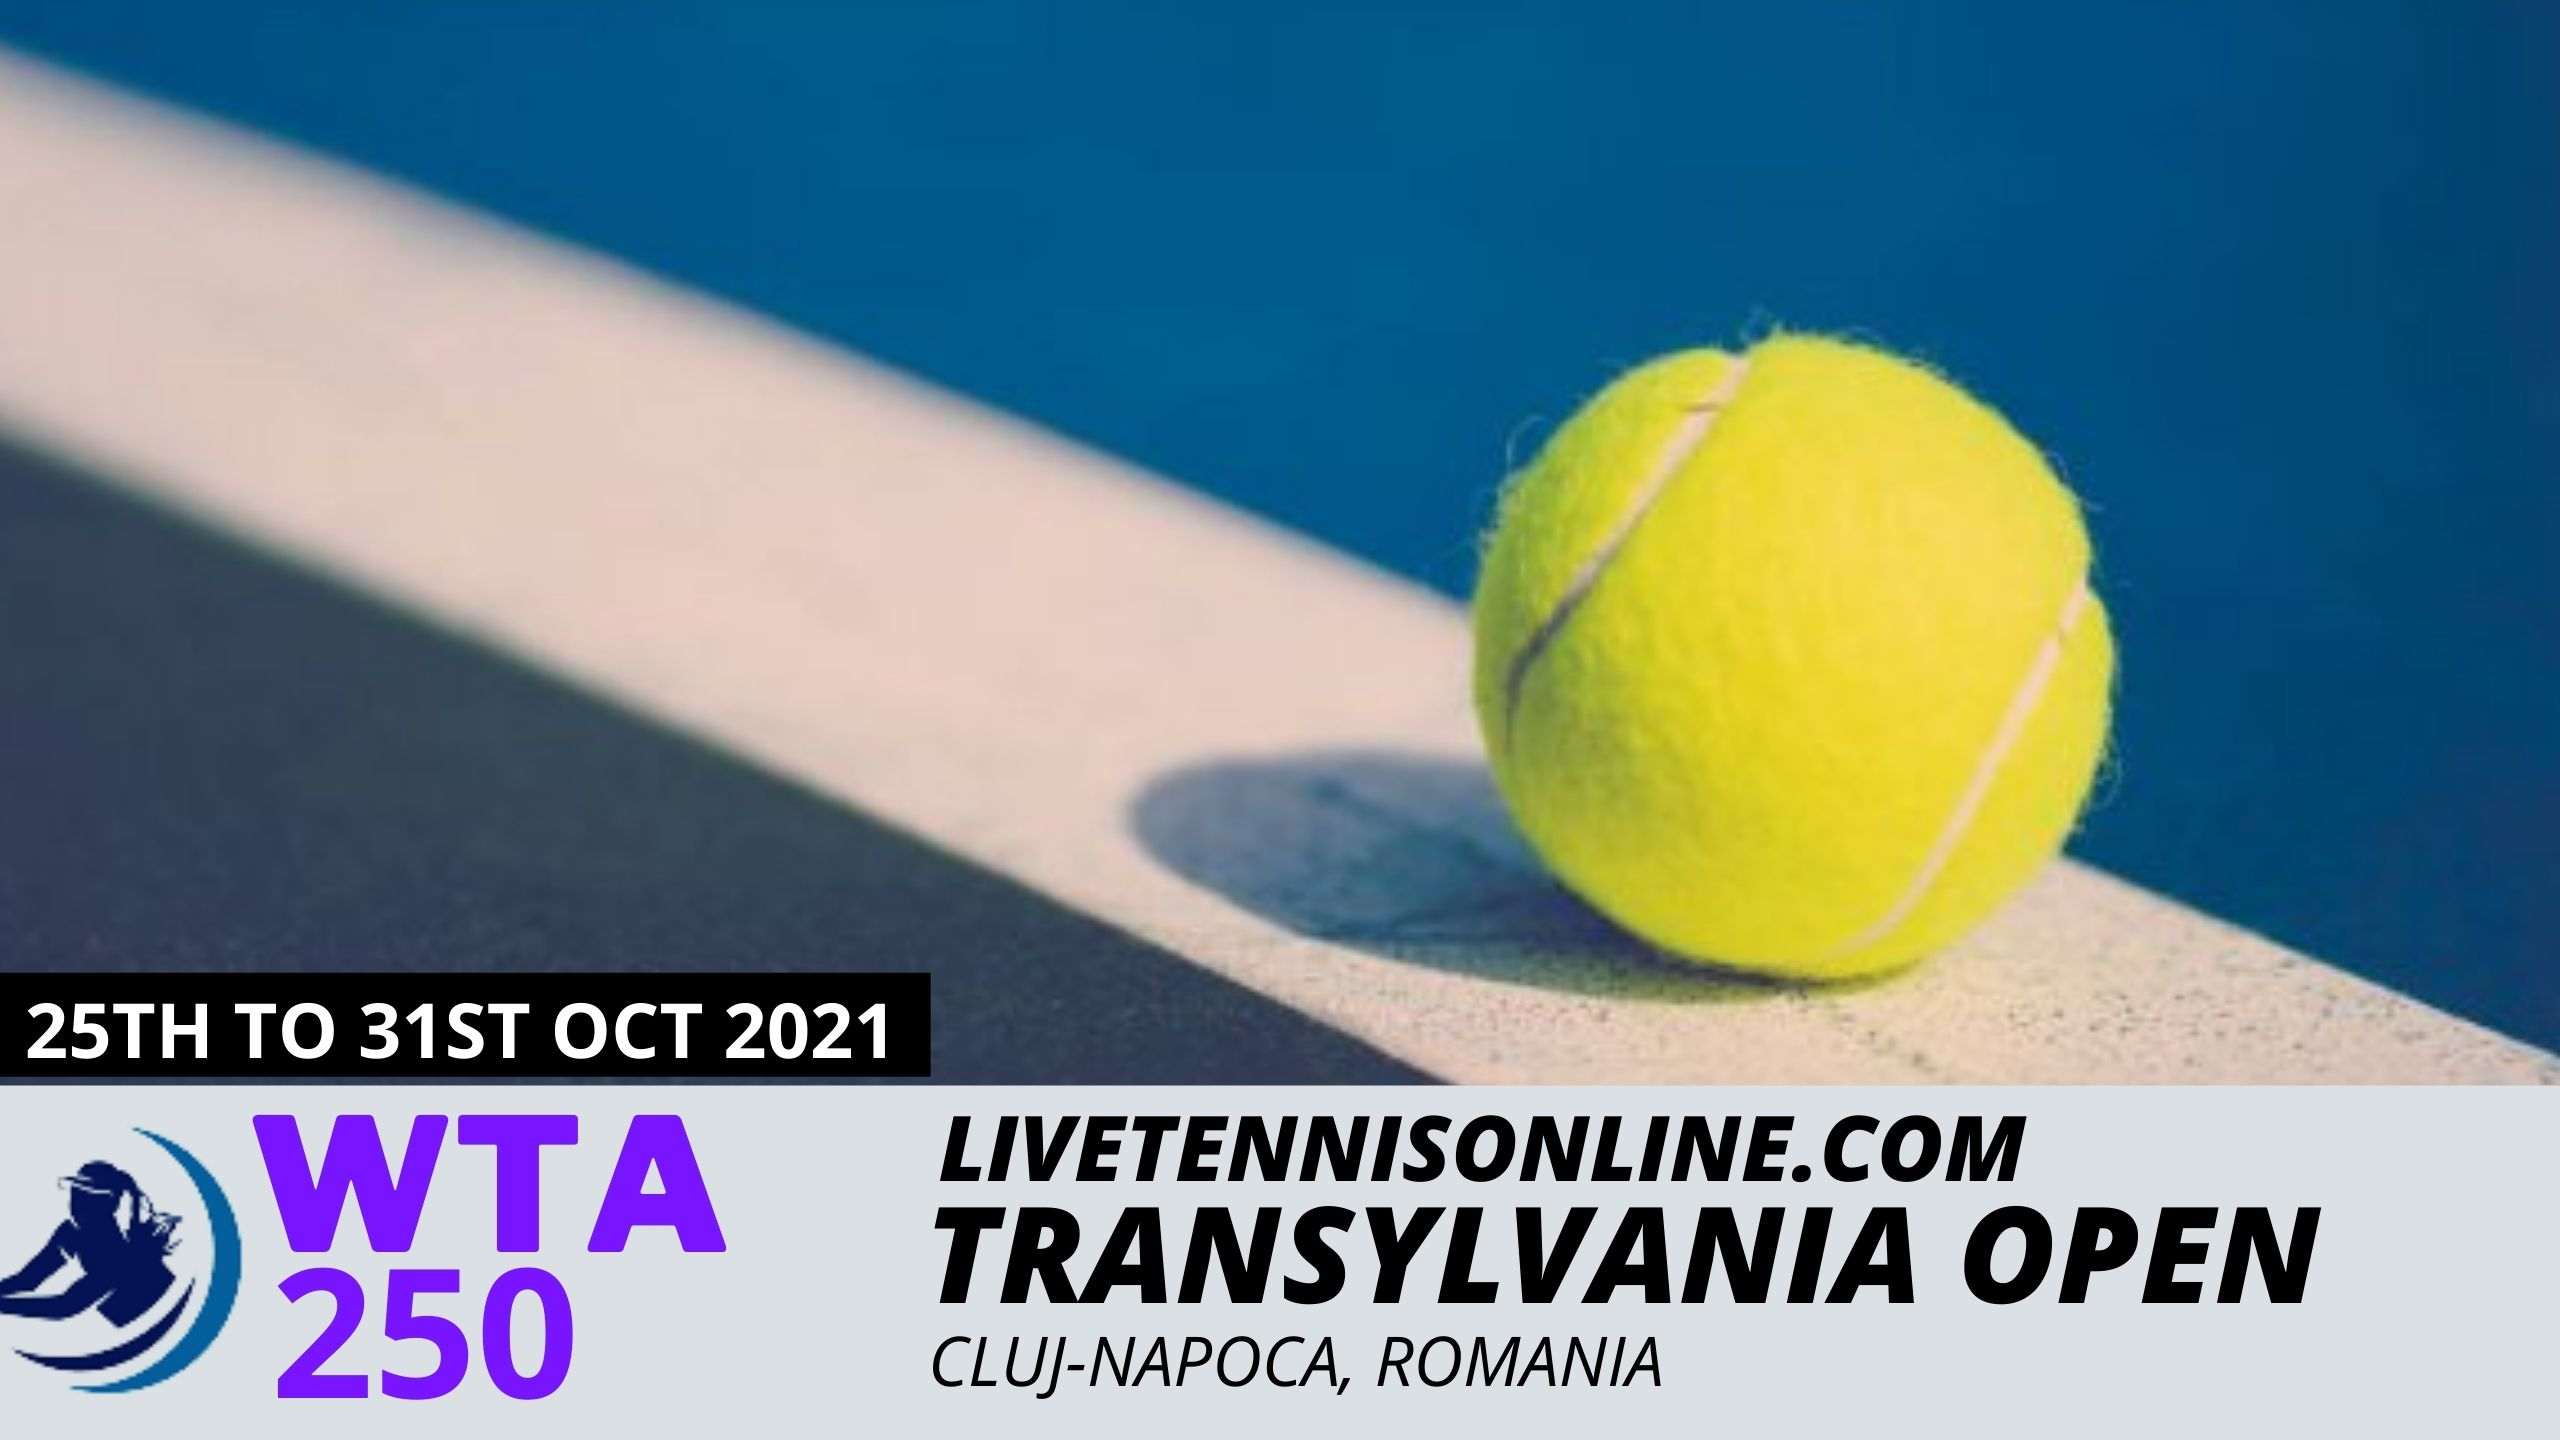 Transylvania Open Tennis Live Stream